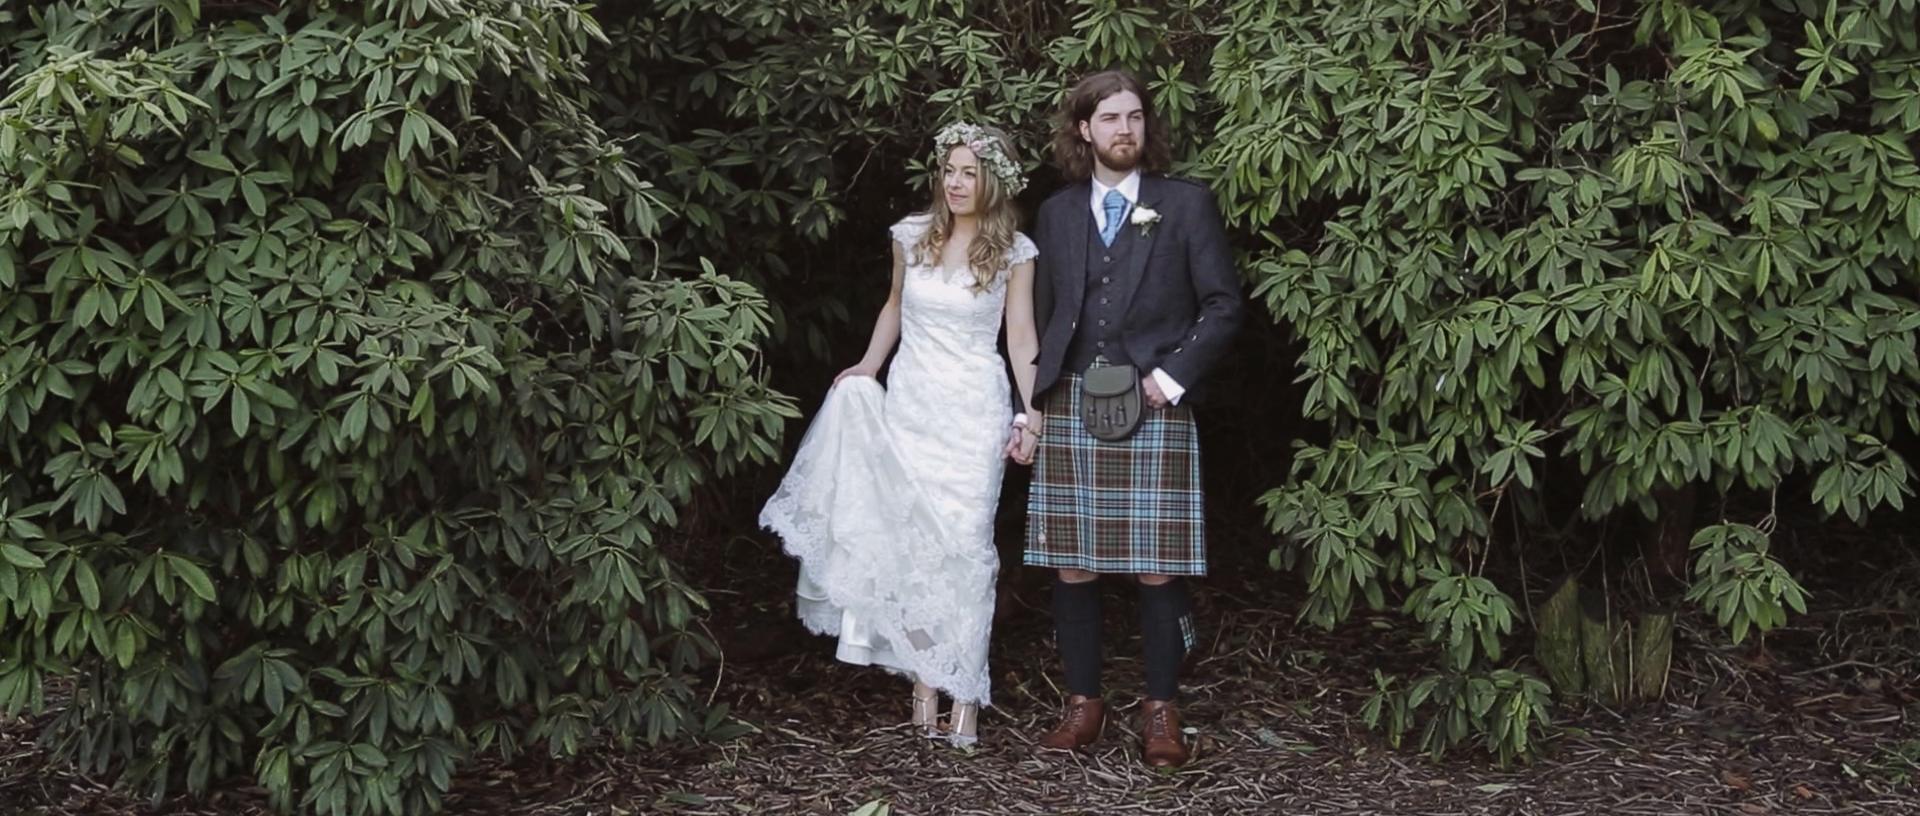 Scottish bride and groom posing for a photo on their wedding day at Dalmahoy Hotel Edinburgh.